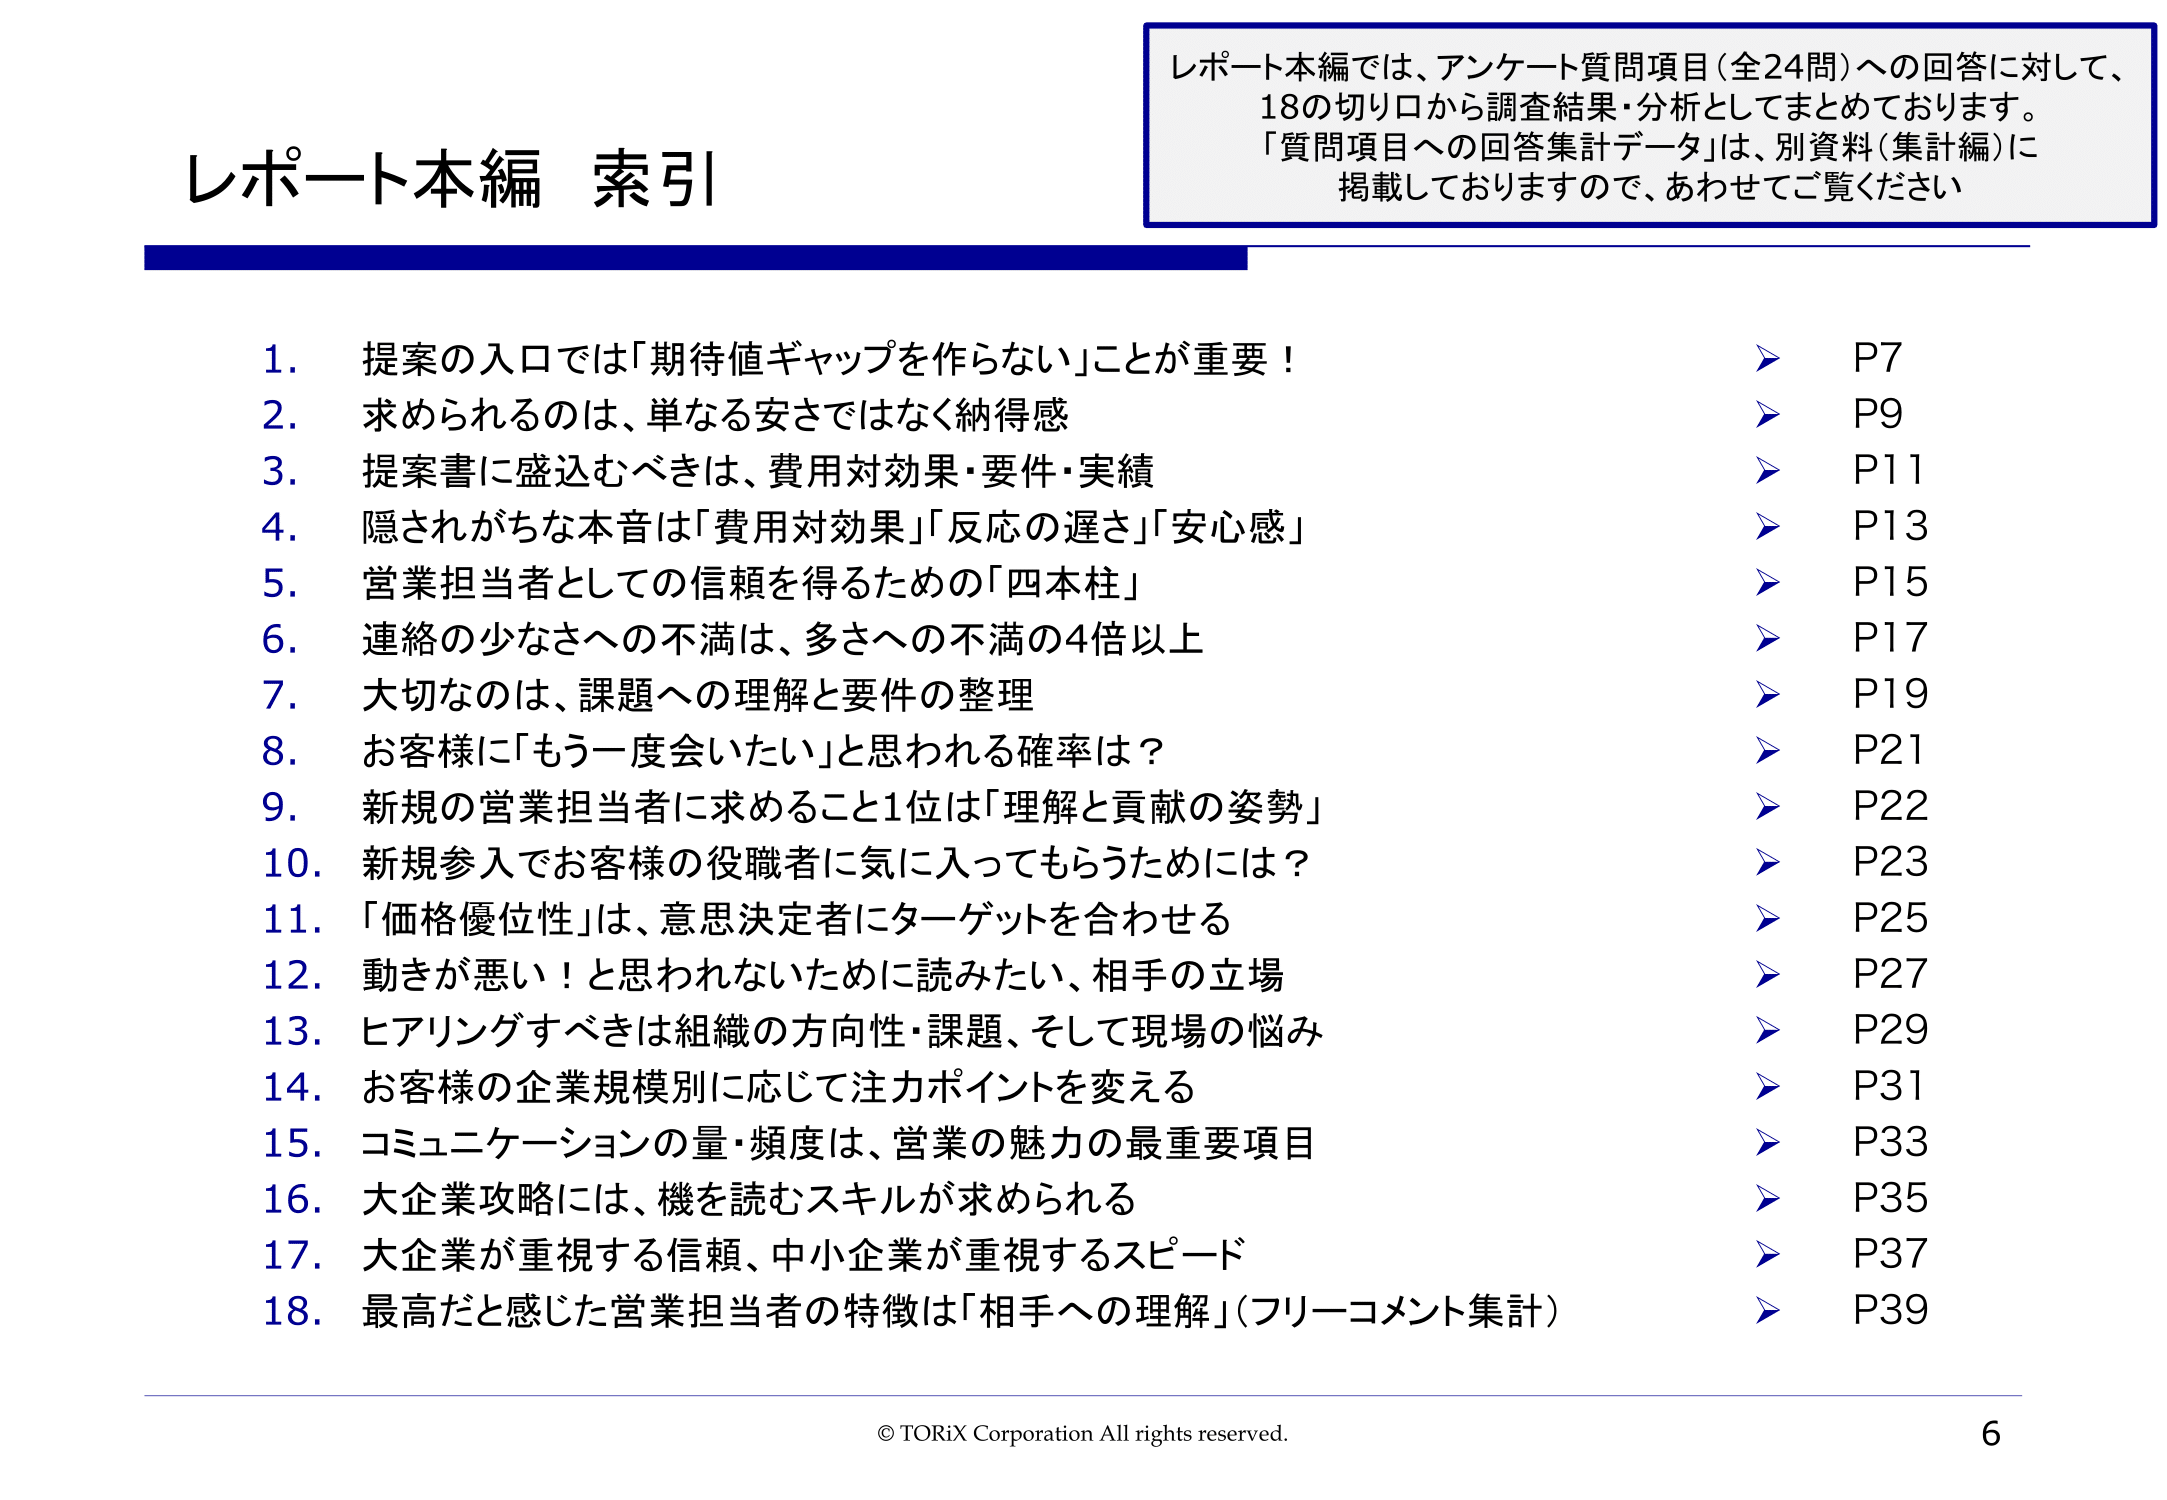 "180912_(TORiX)""選ばれ続ける営業""に関する調査レポート-06.png"